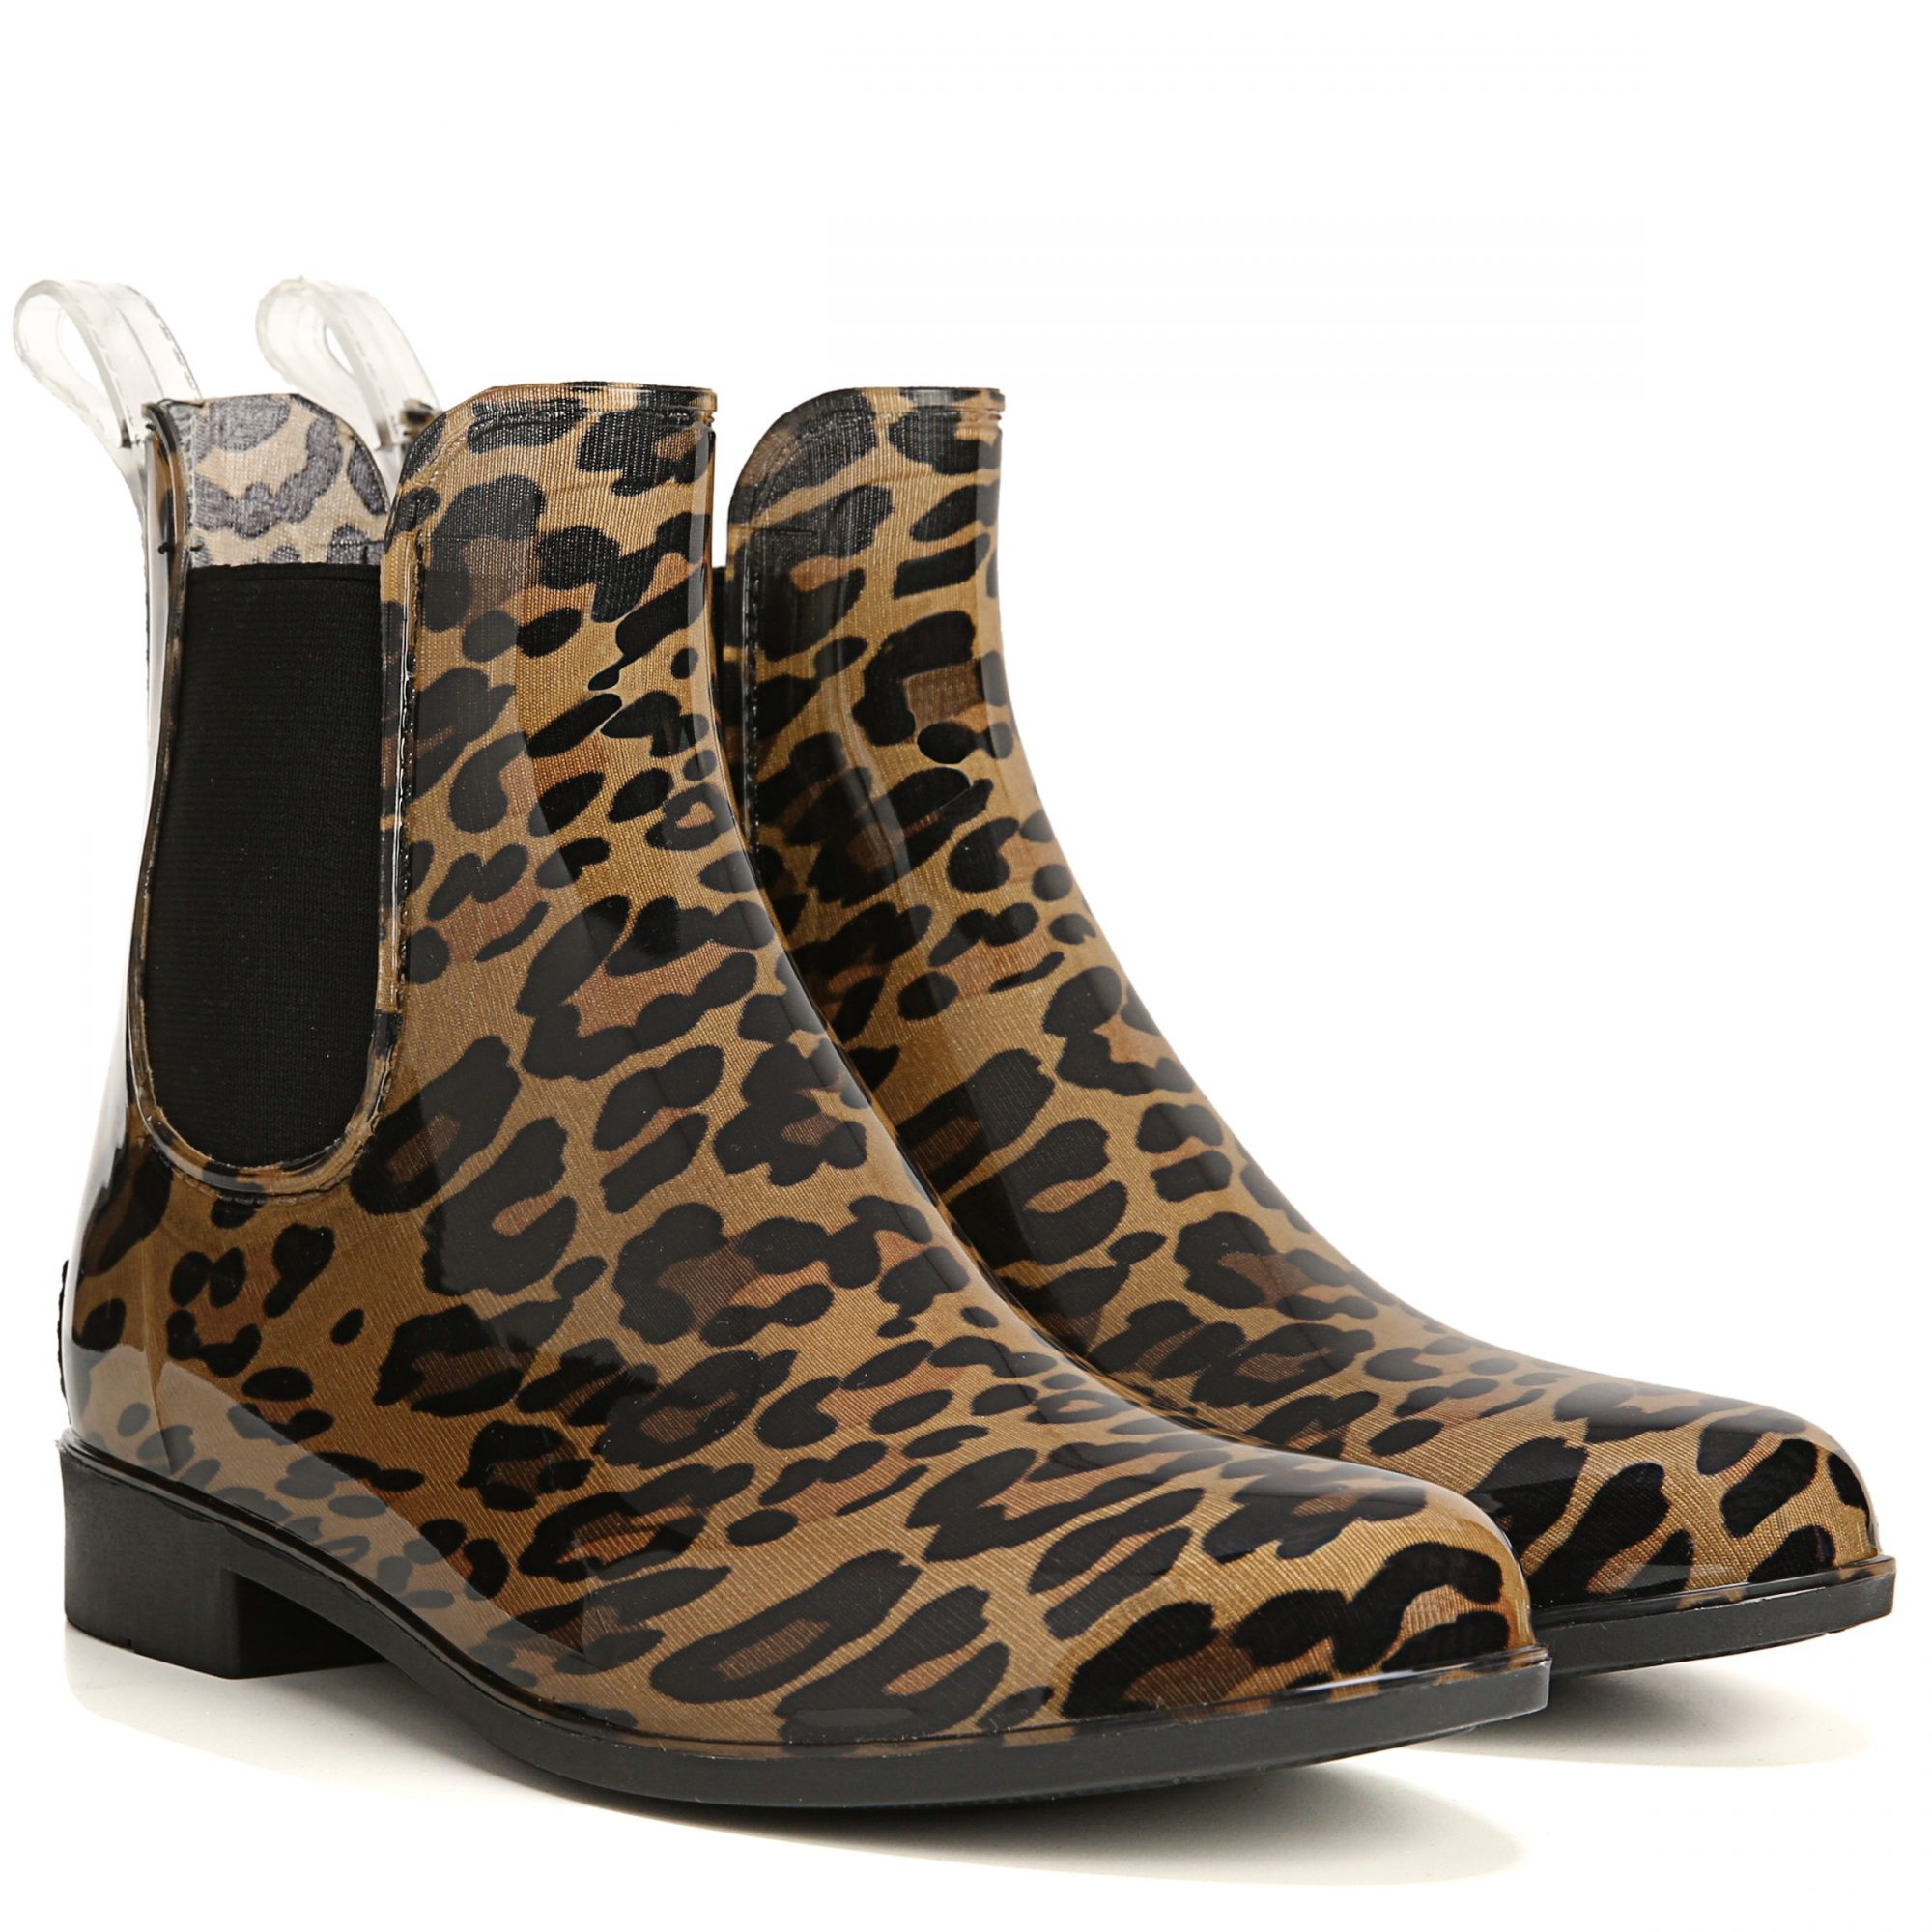 Lifestride Boots